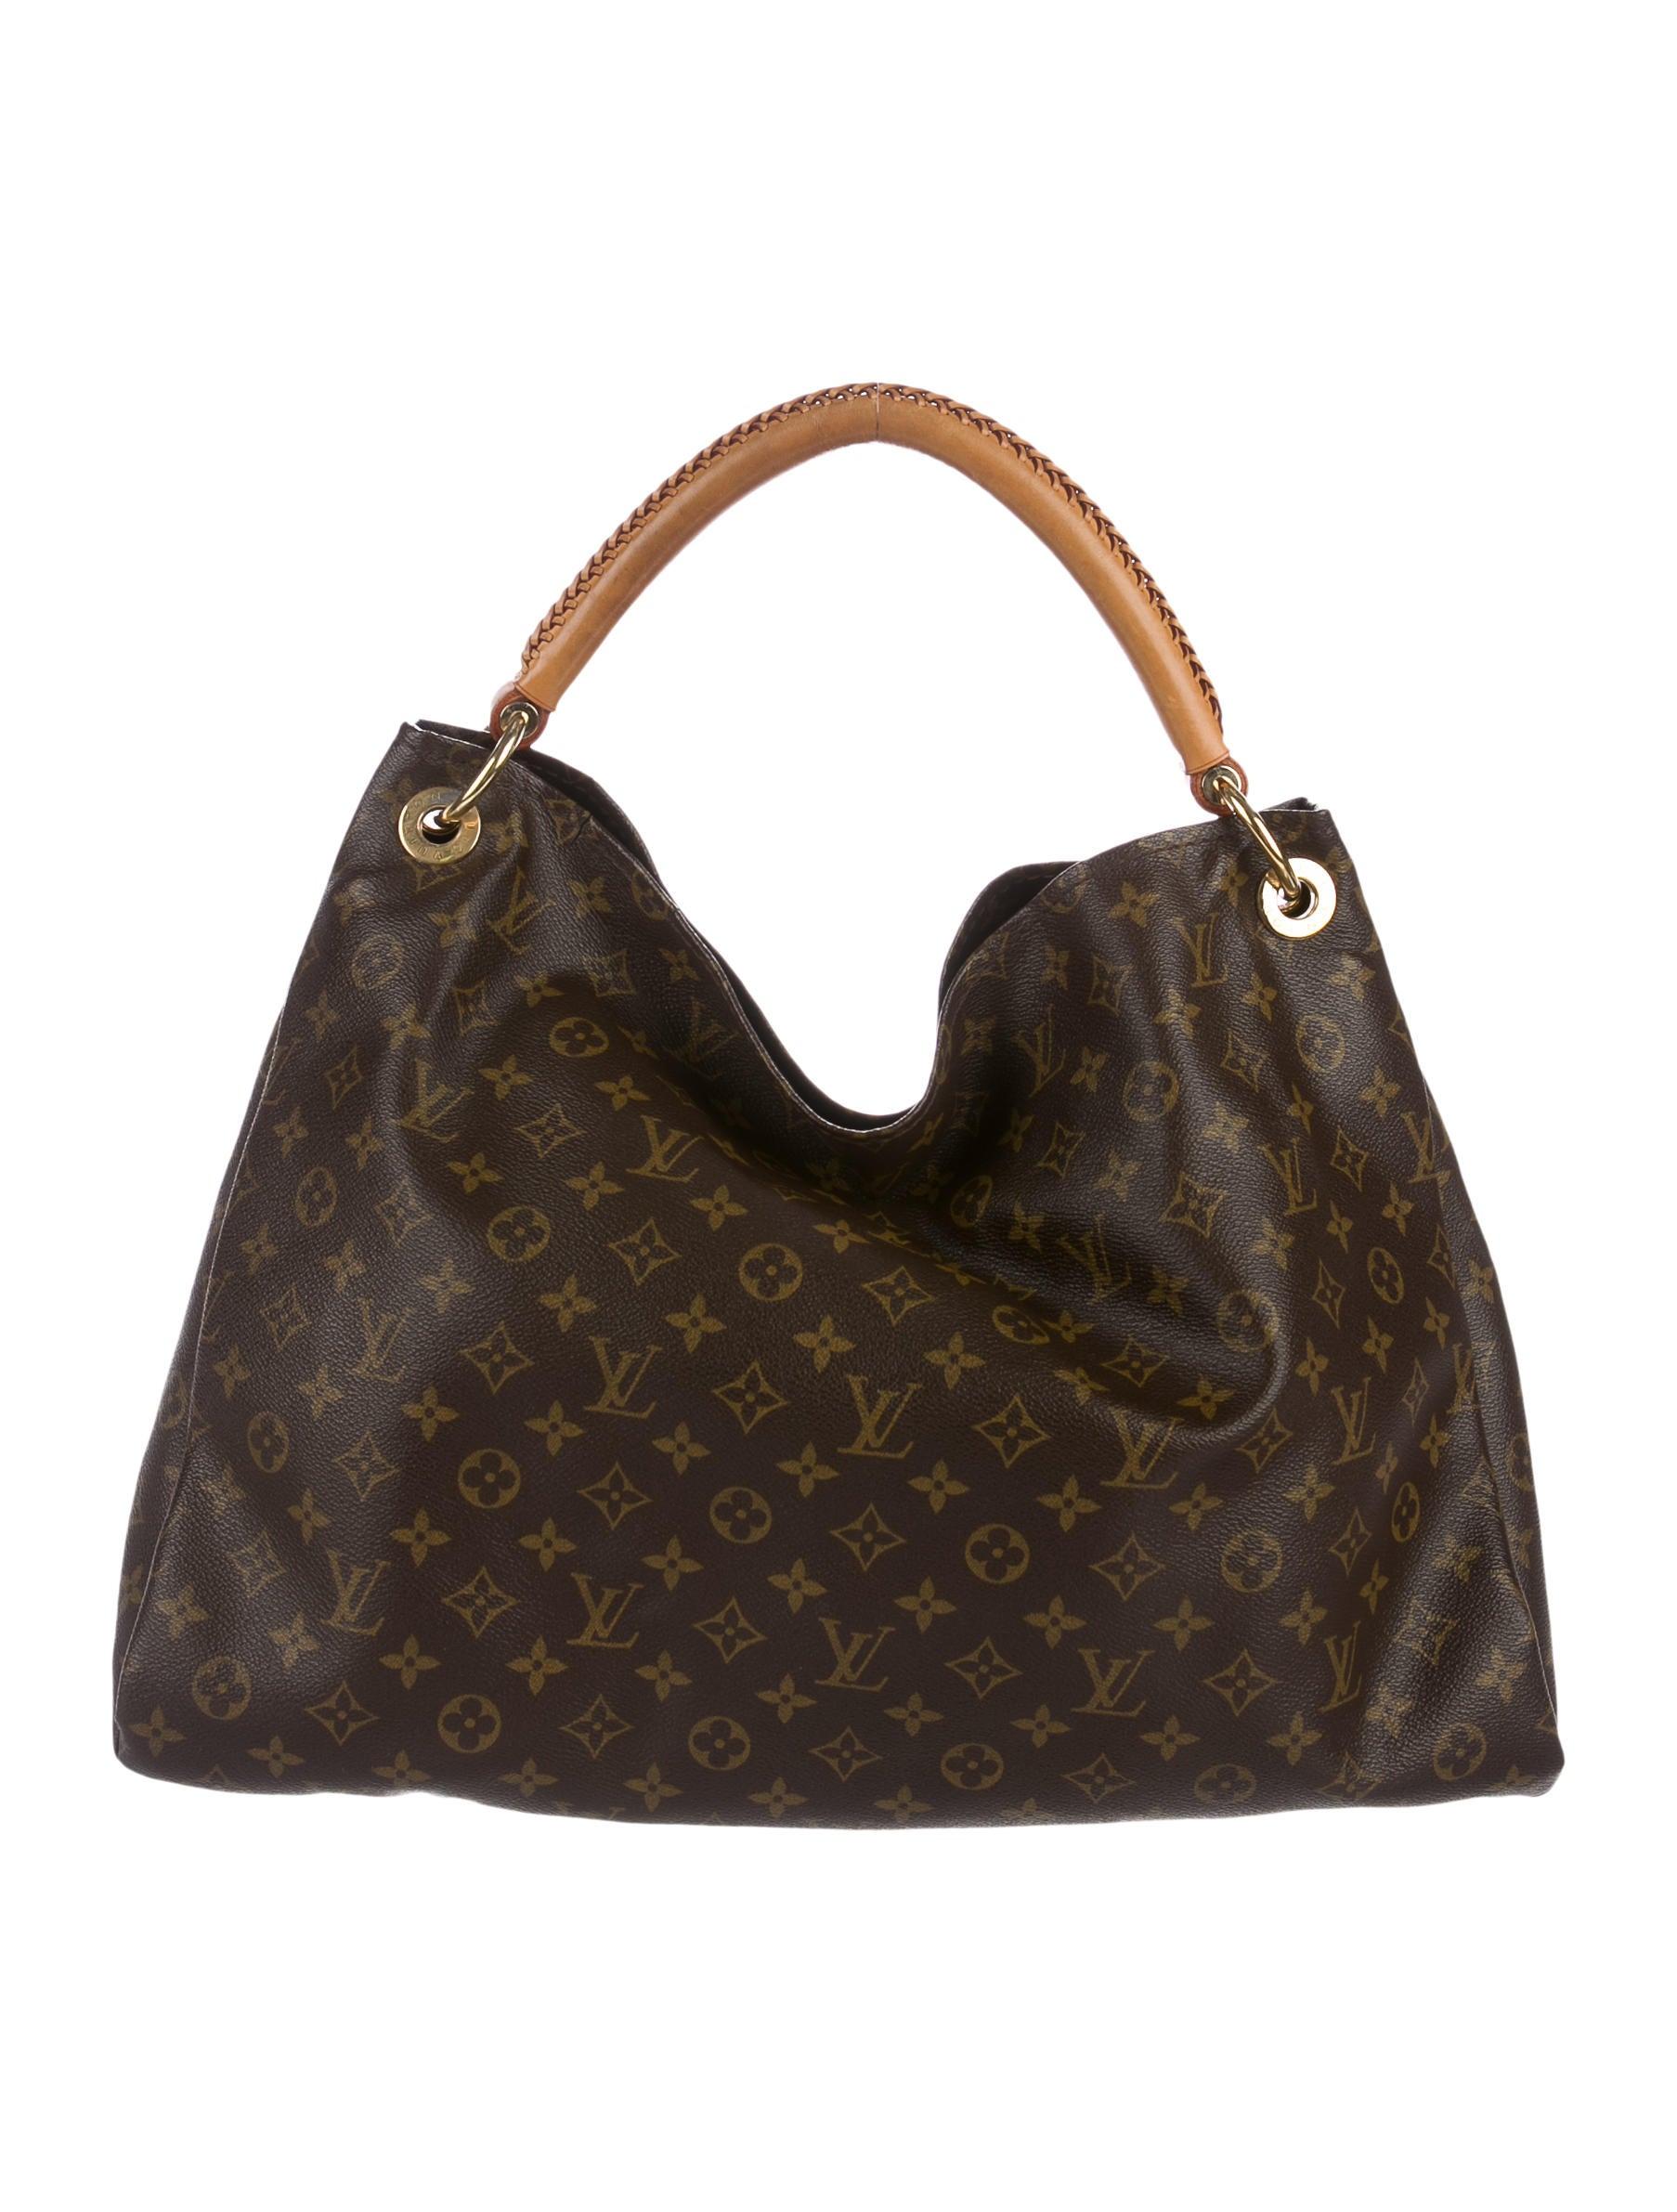 Louis Vuitton Monogram Artsy Gm Handbags Lou123961